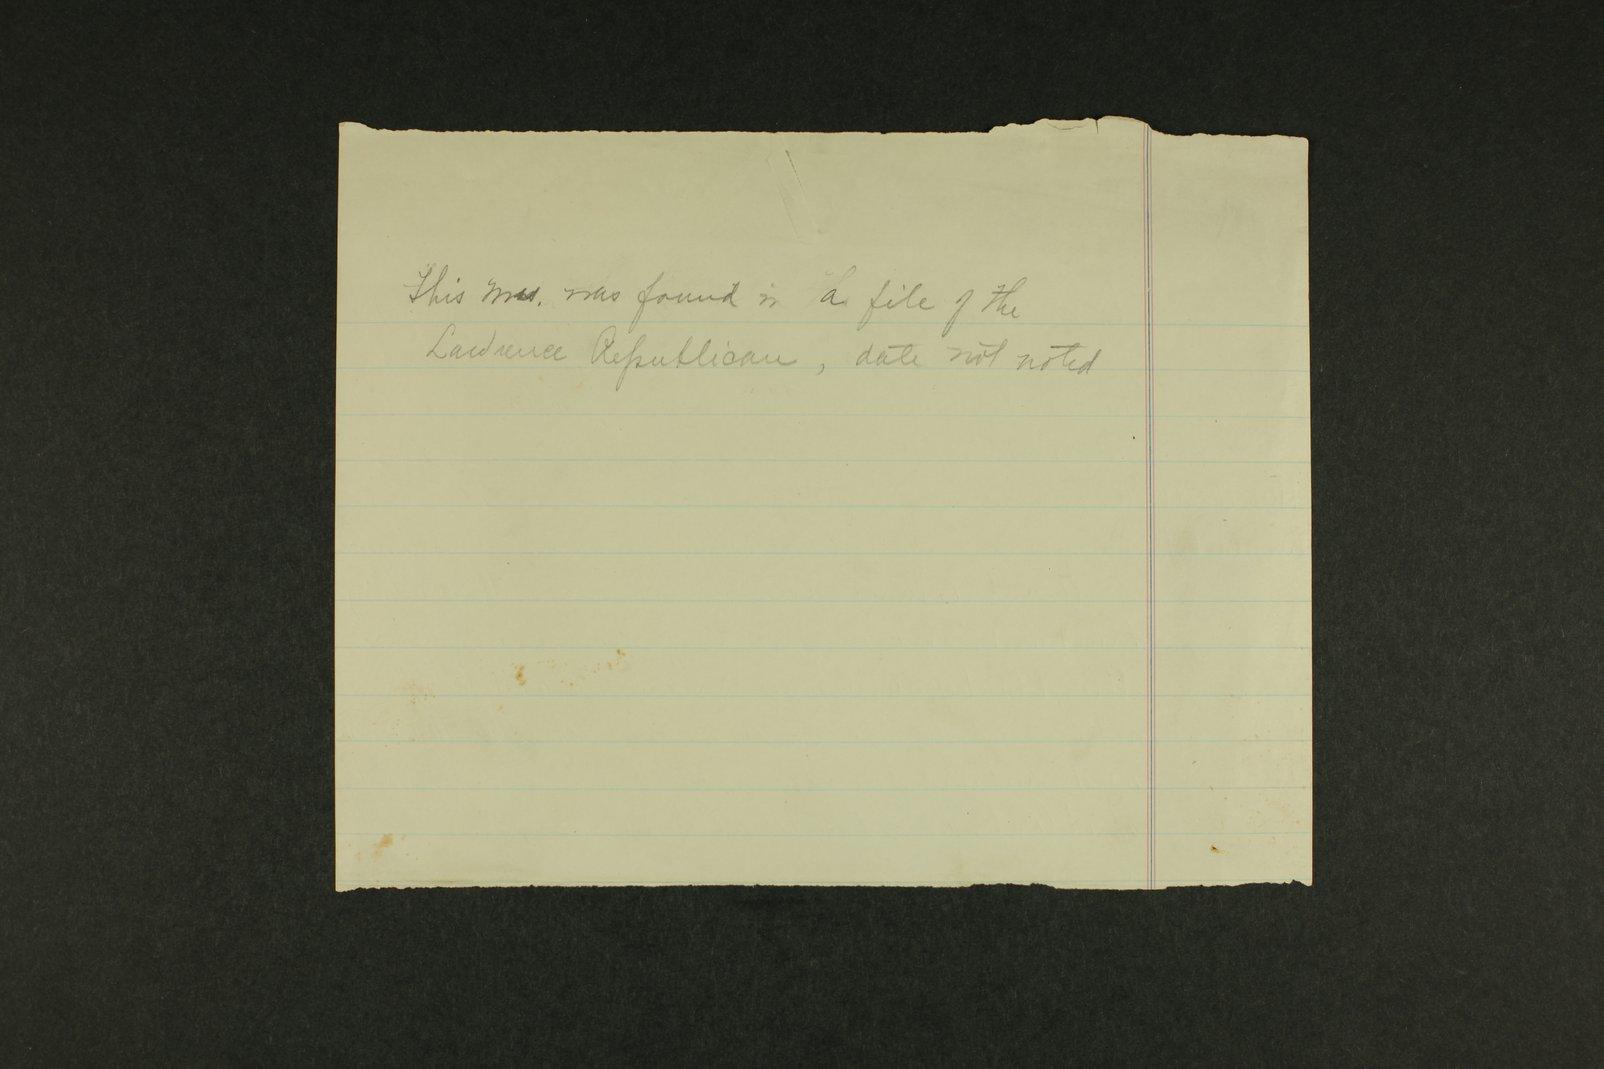 Temperance history correspondence - 12